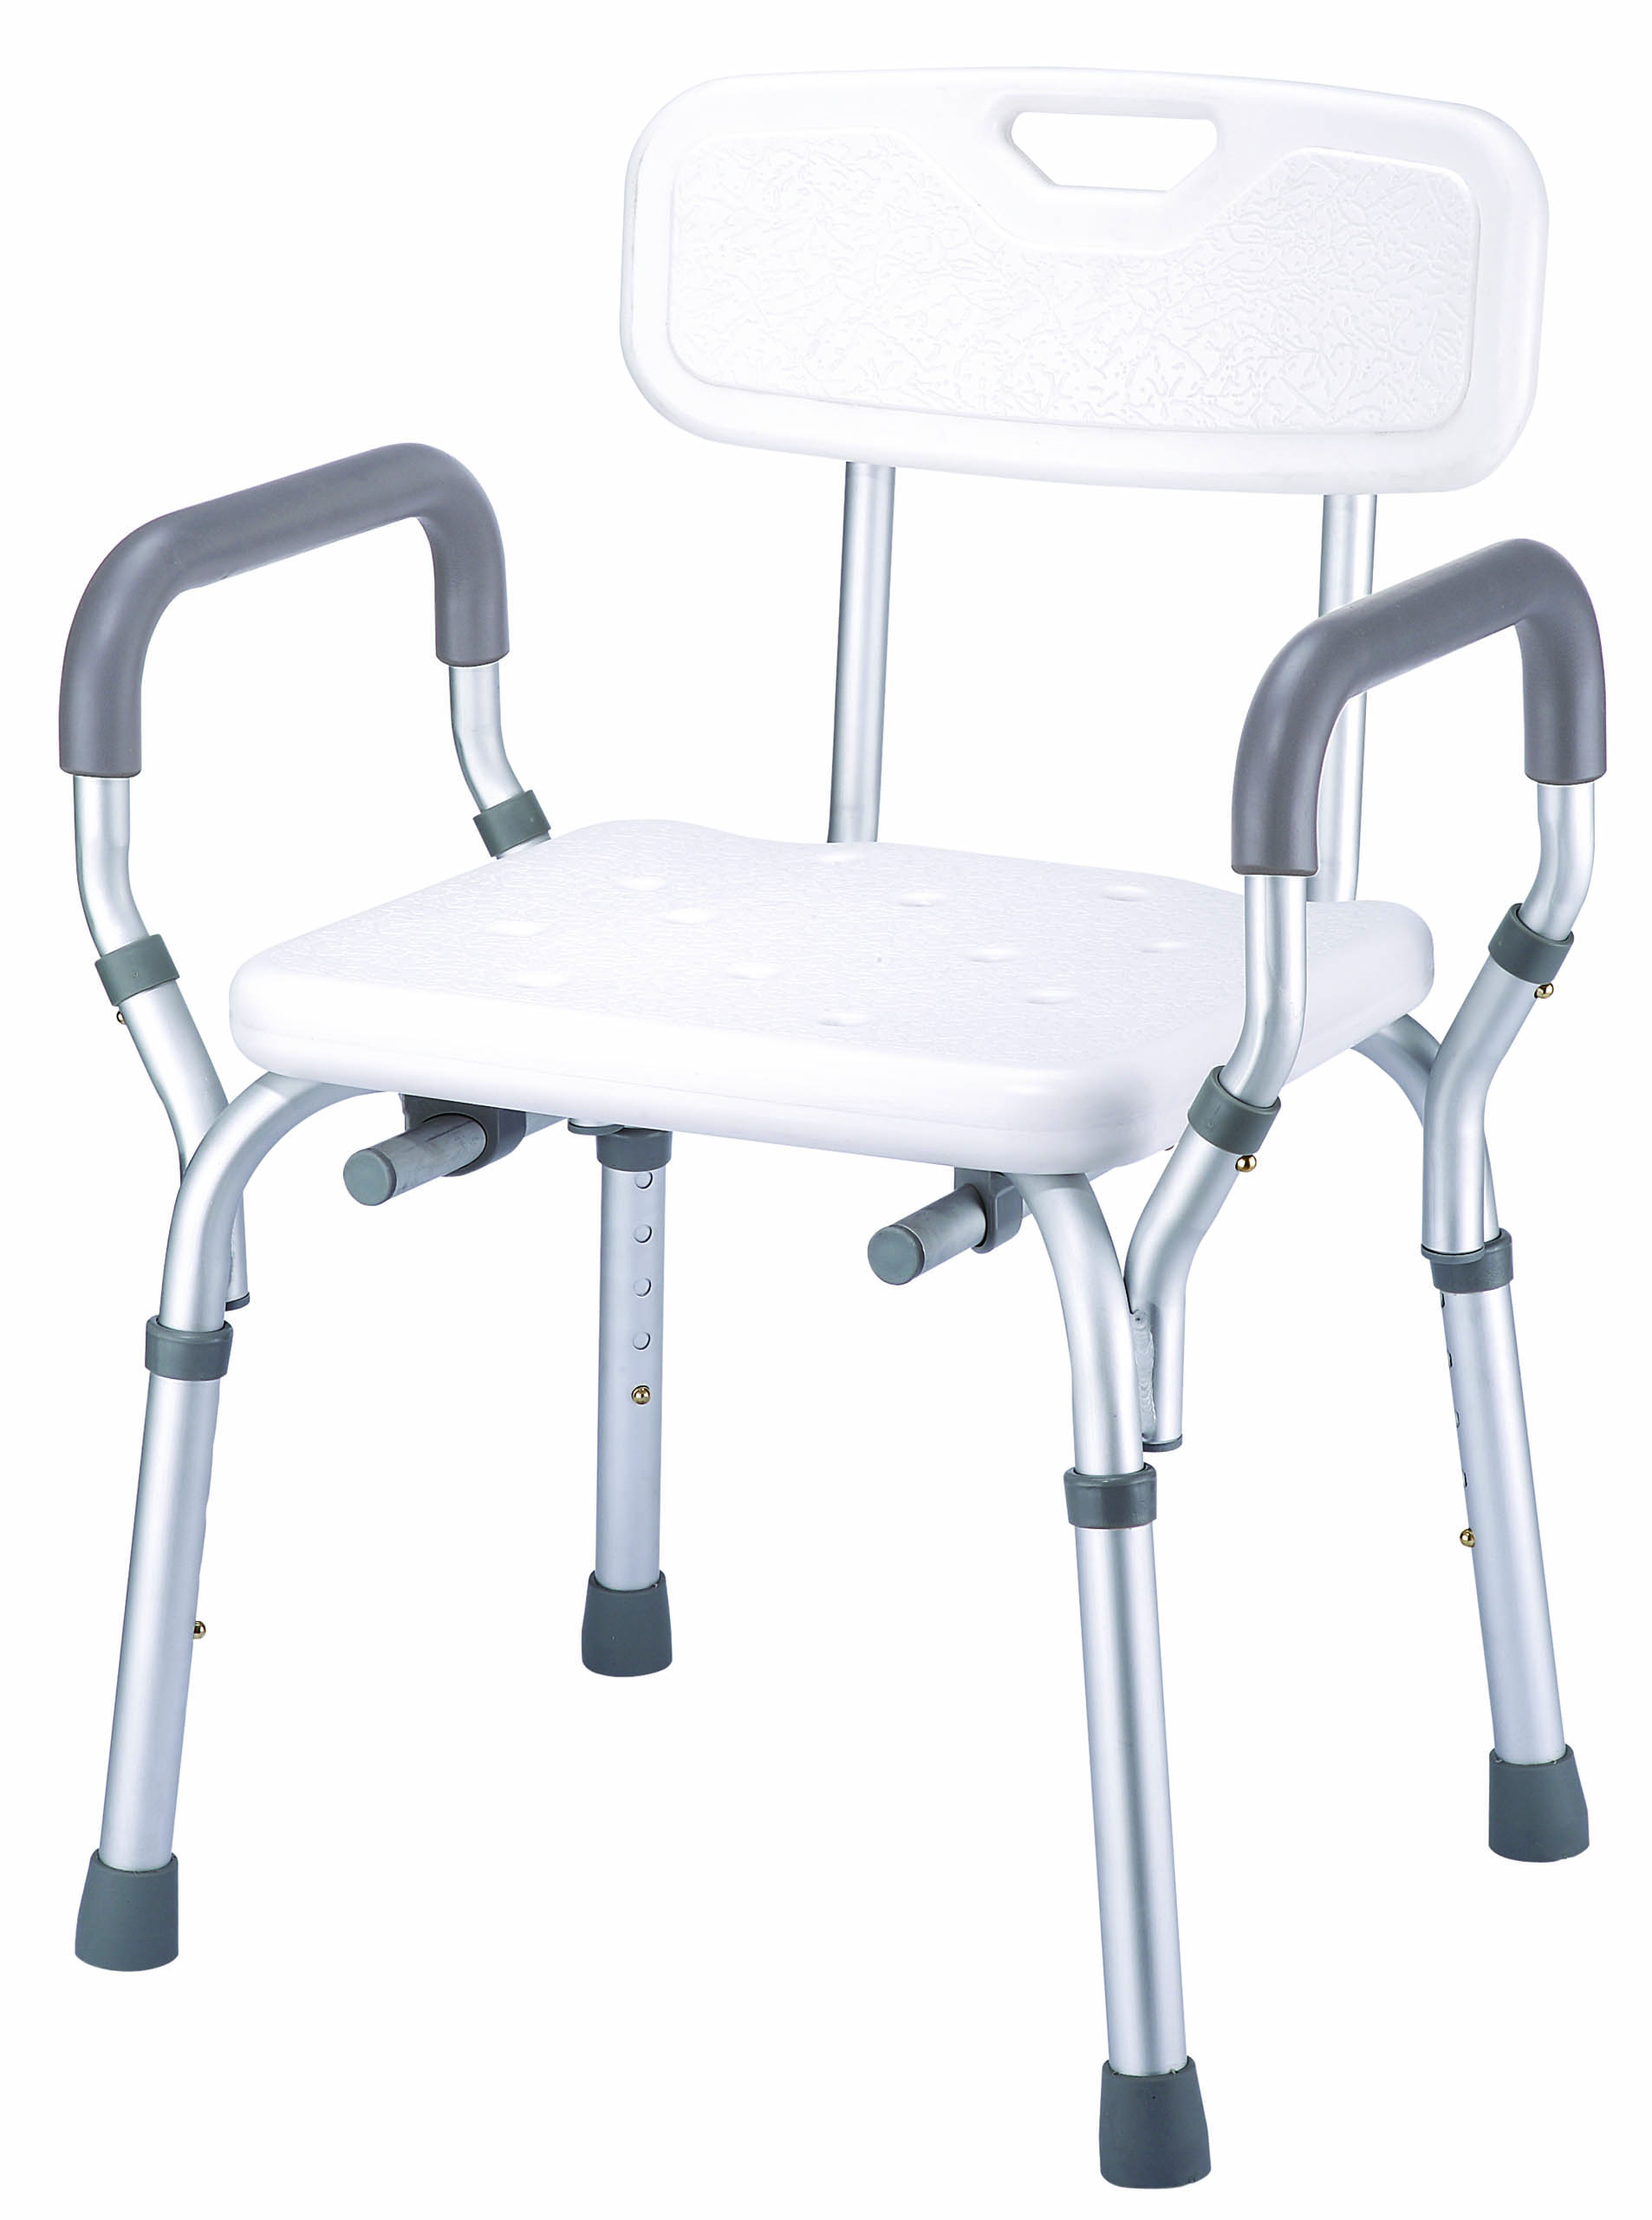 RG6001 & RG6002 Shower Chair with Backrest - gp medical